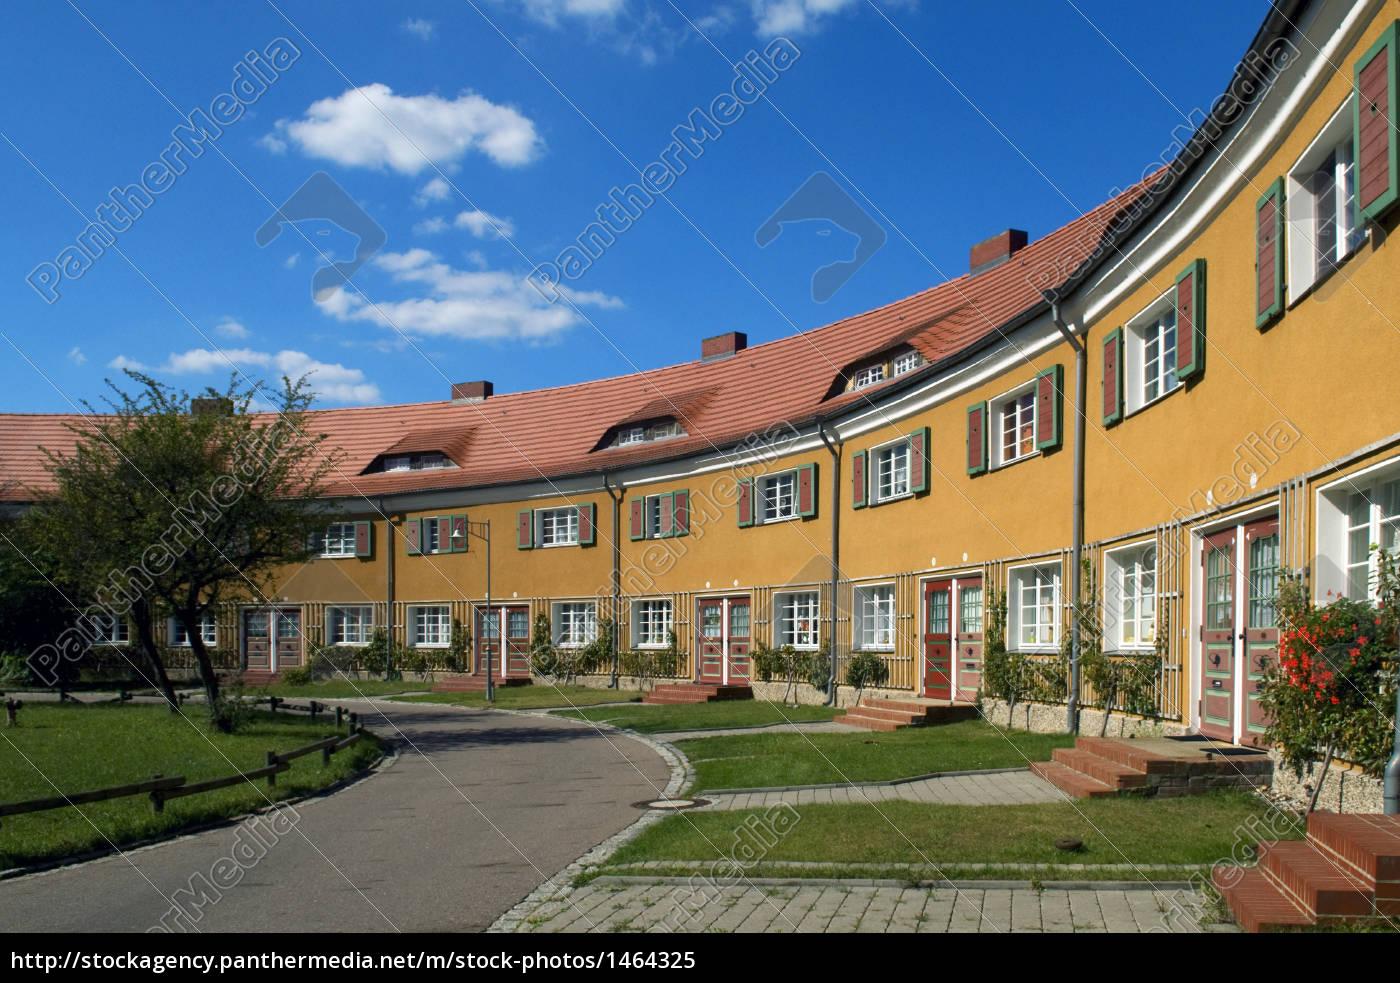 wb, piesteritz, 2 - 1464325